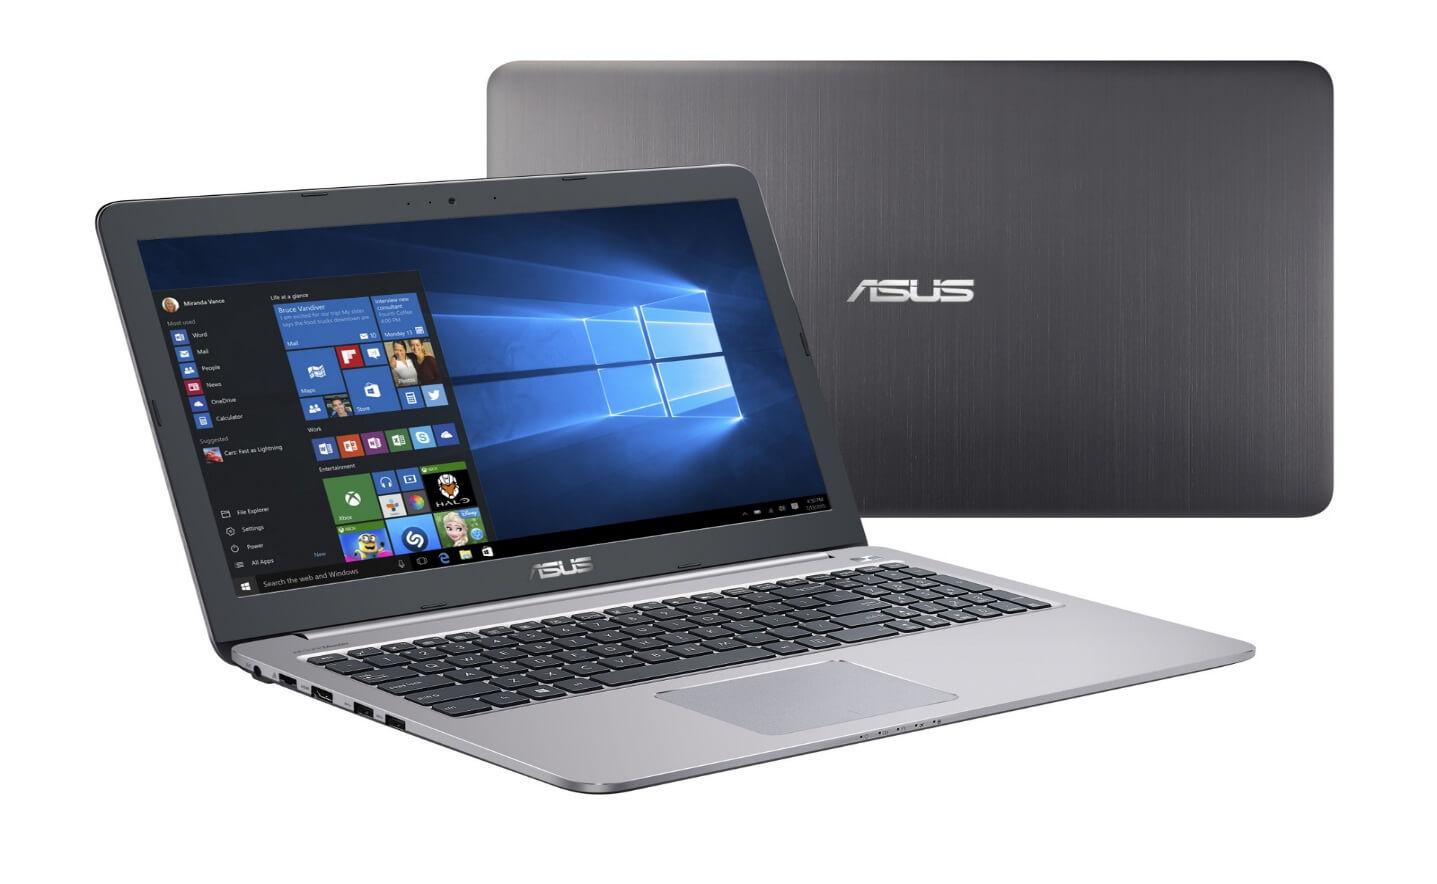 man-hinh-laptop-khong-net